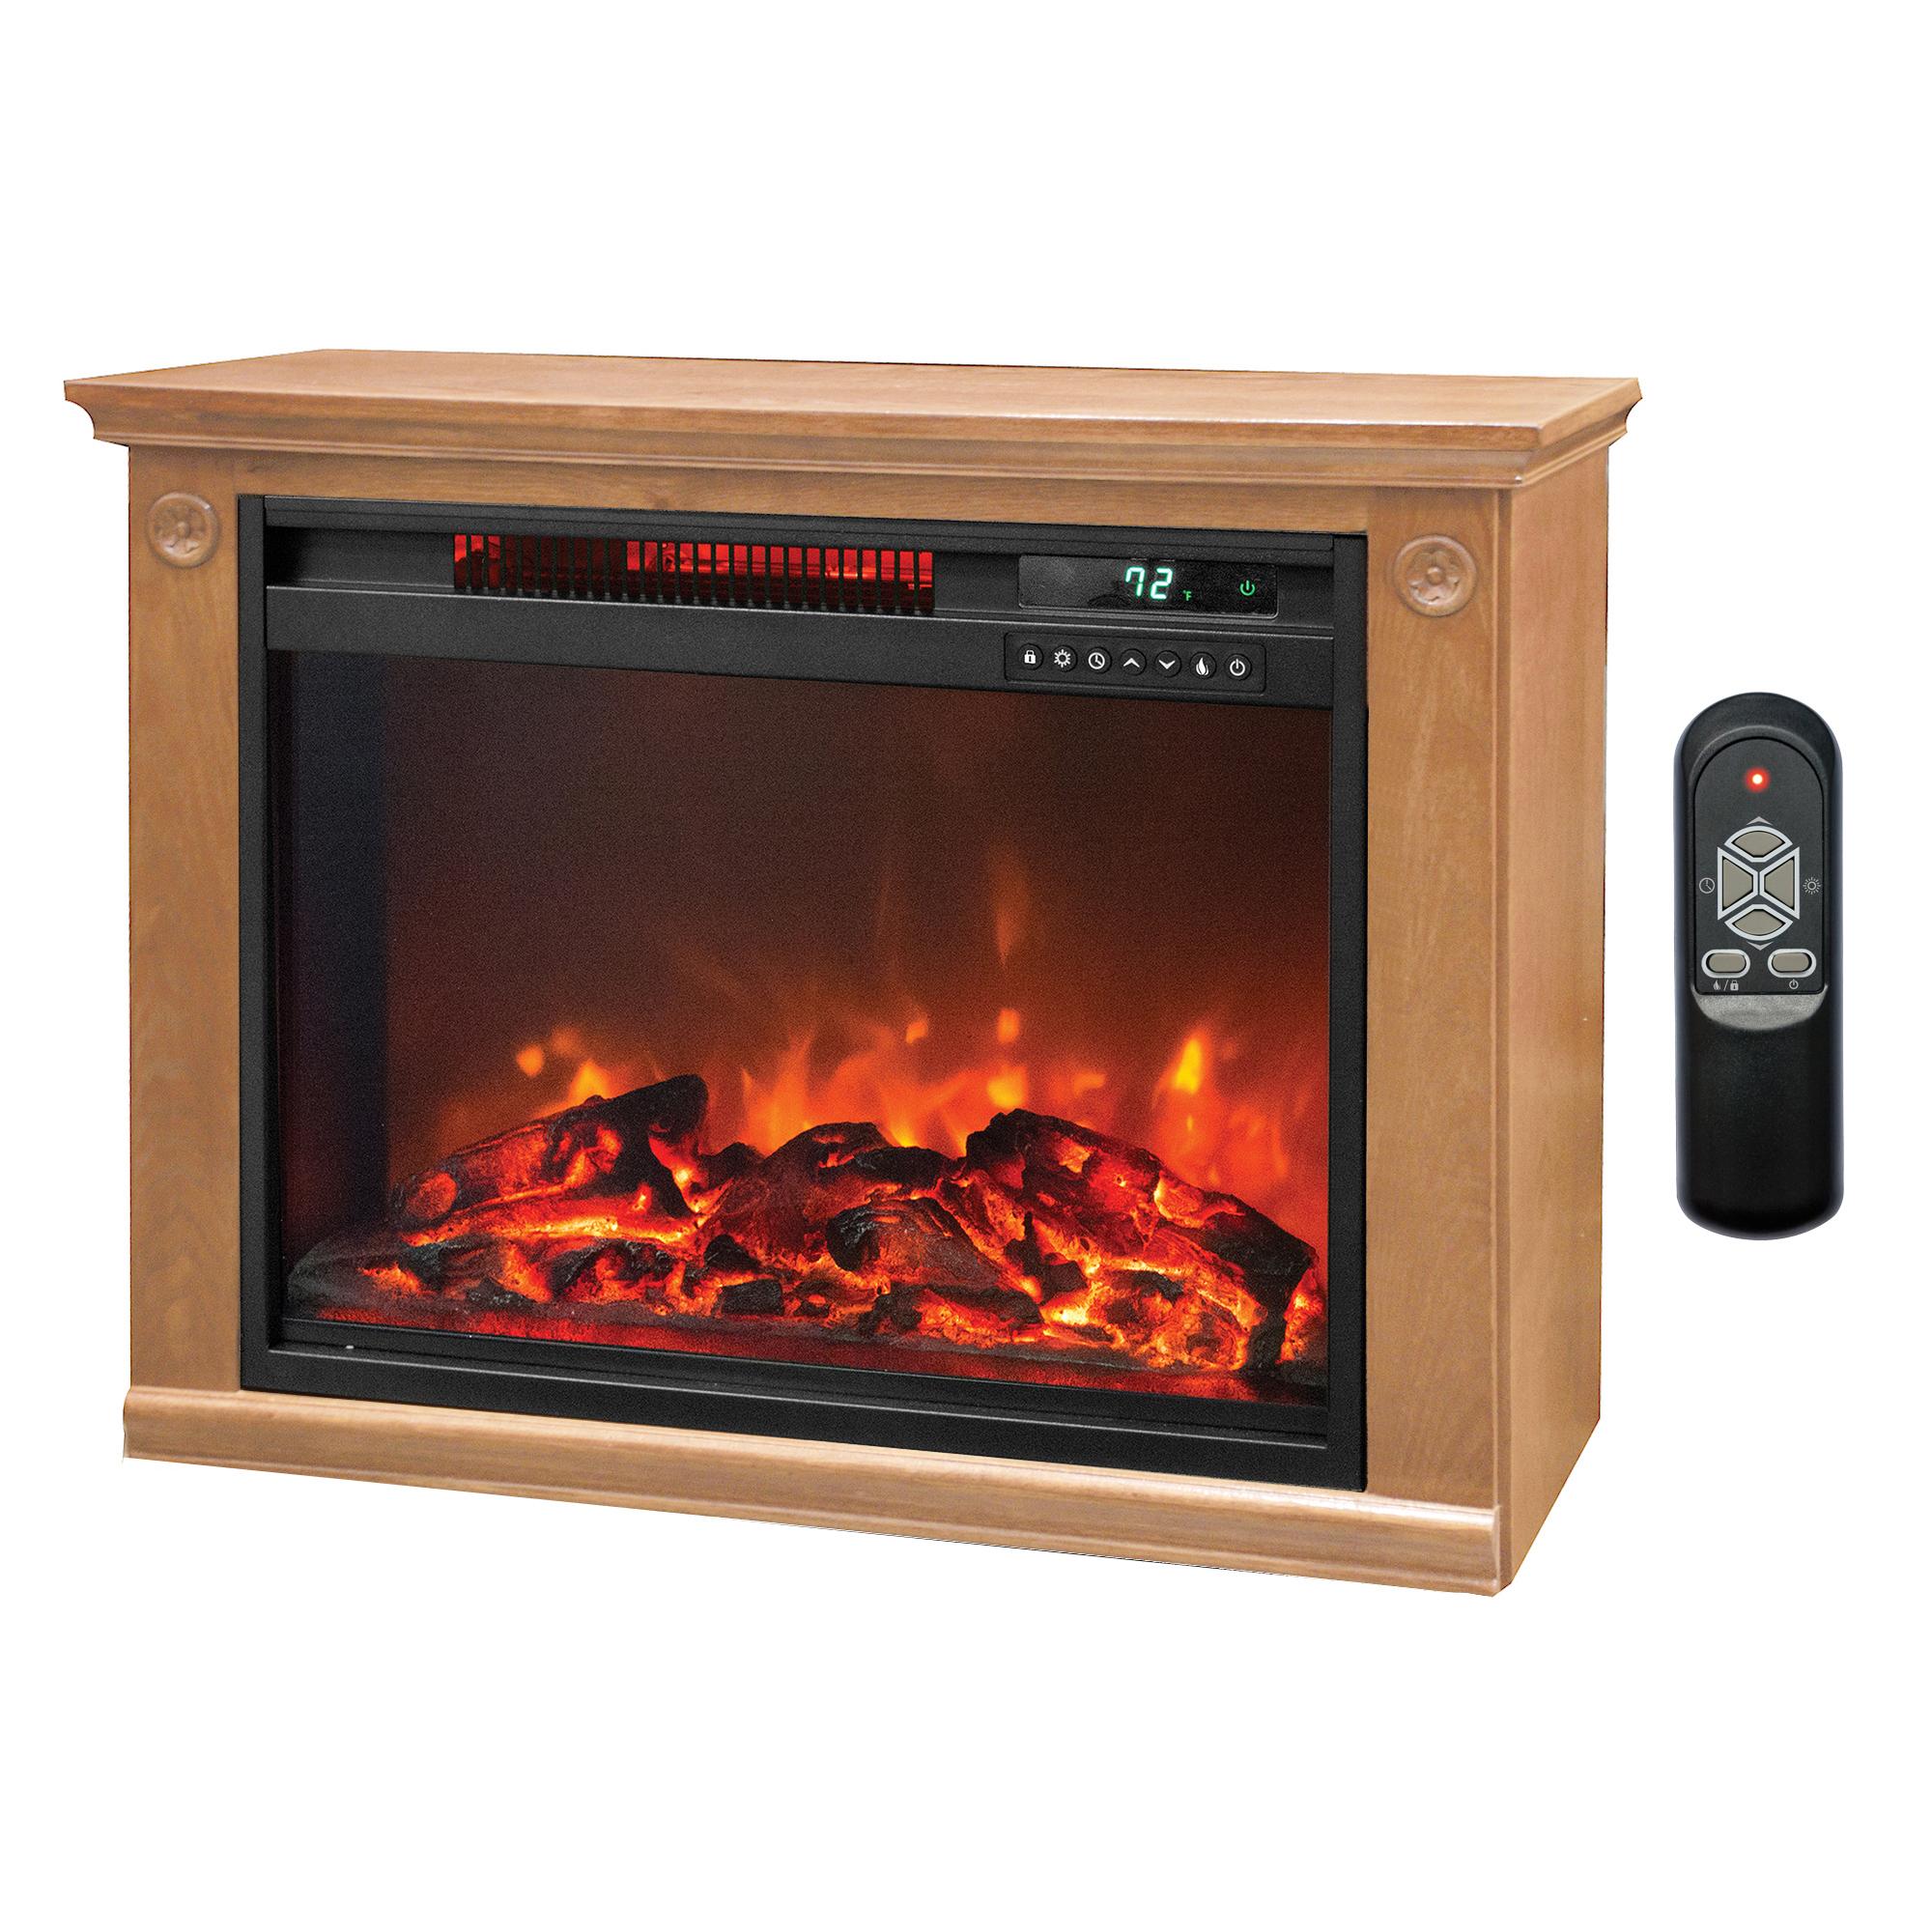 Astounding Lifesmart Large Room Infrared Fireplace Heater Machost Co Dining Chair Design Ideas Machostcouk